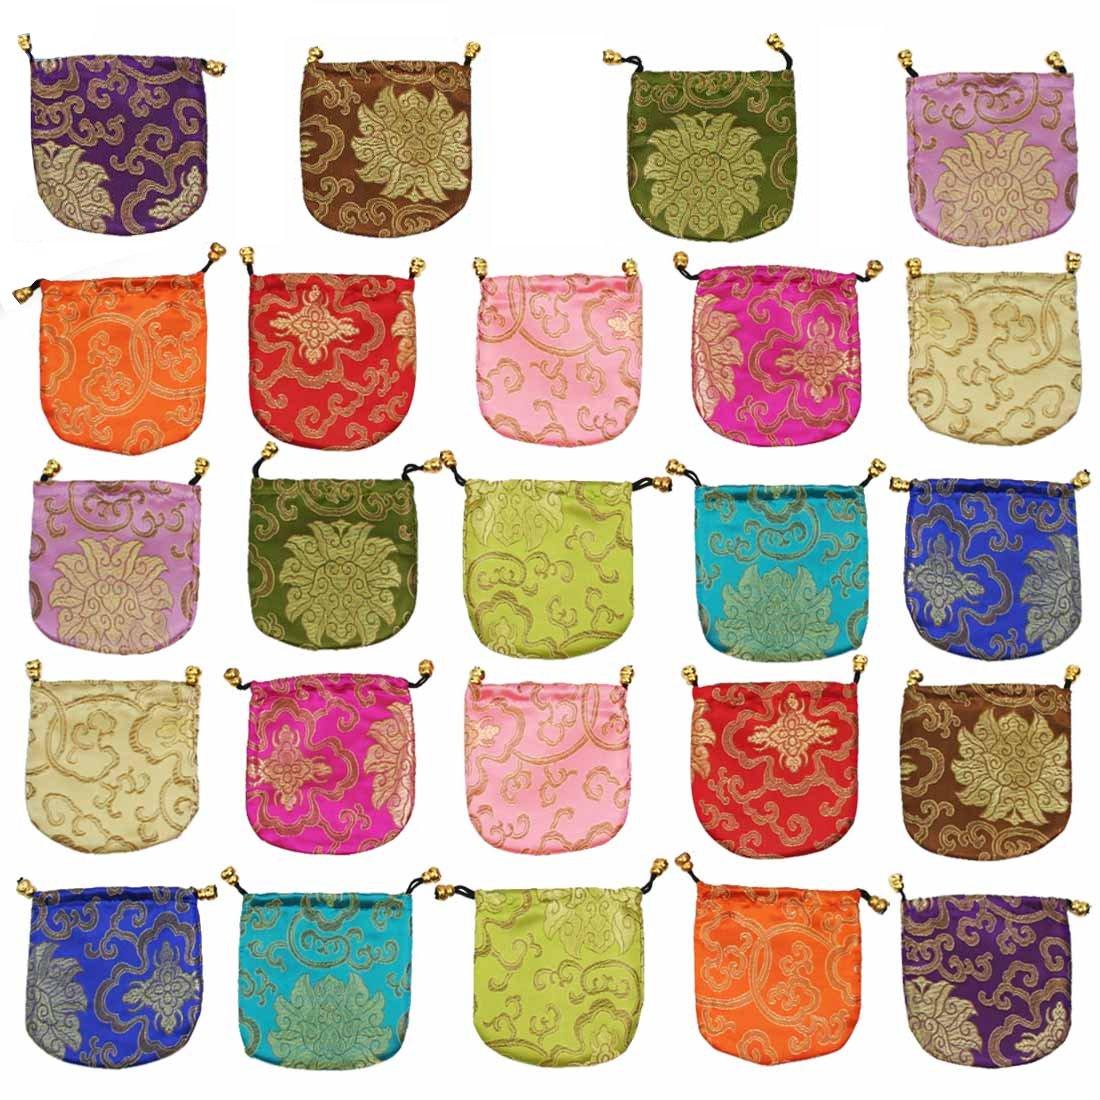 kilofly Chinese Silk Brocade Drawstring Jewelry Pouch Bag Value Set, 24 pcs TBA401set24